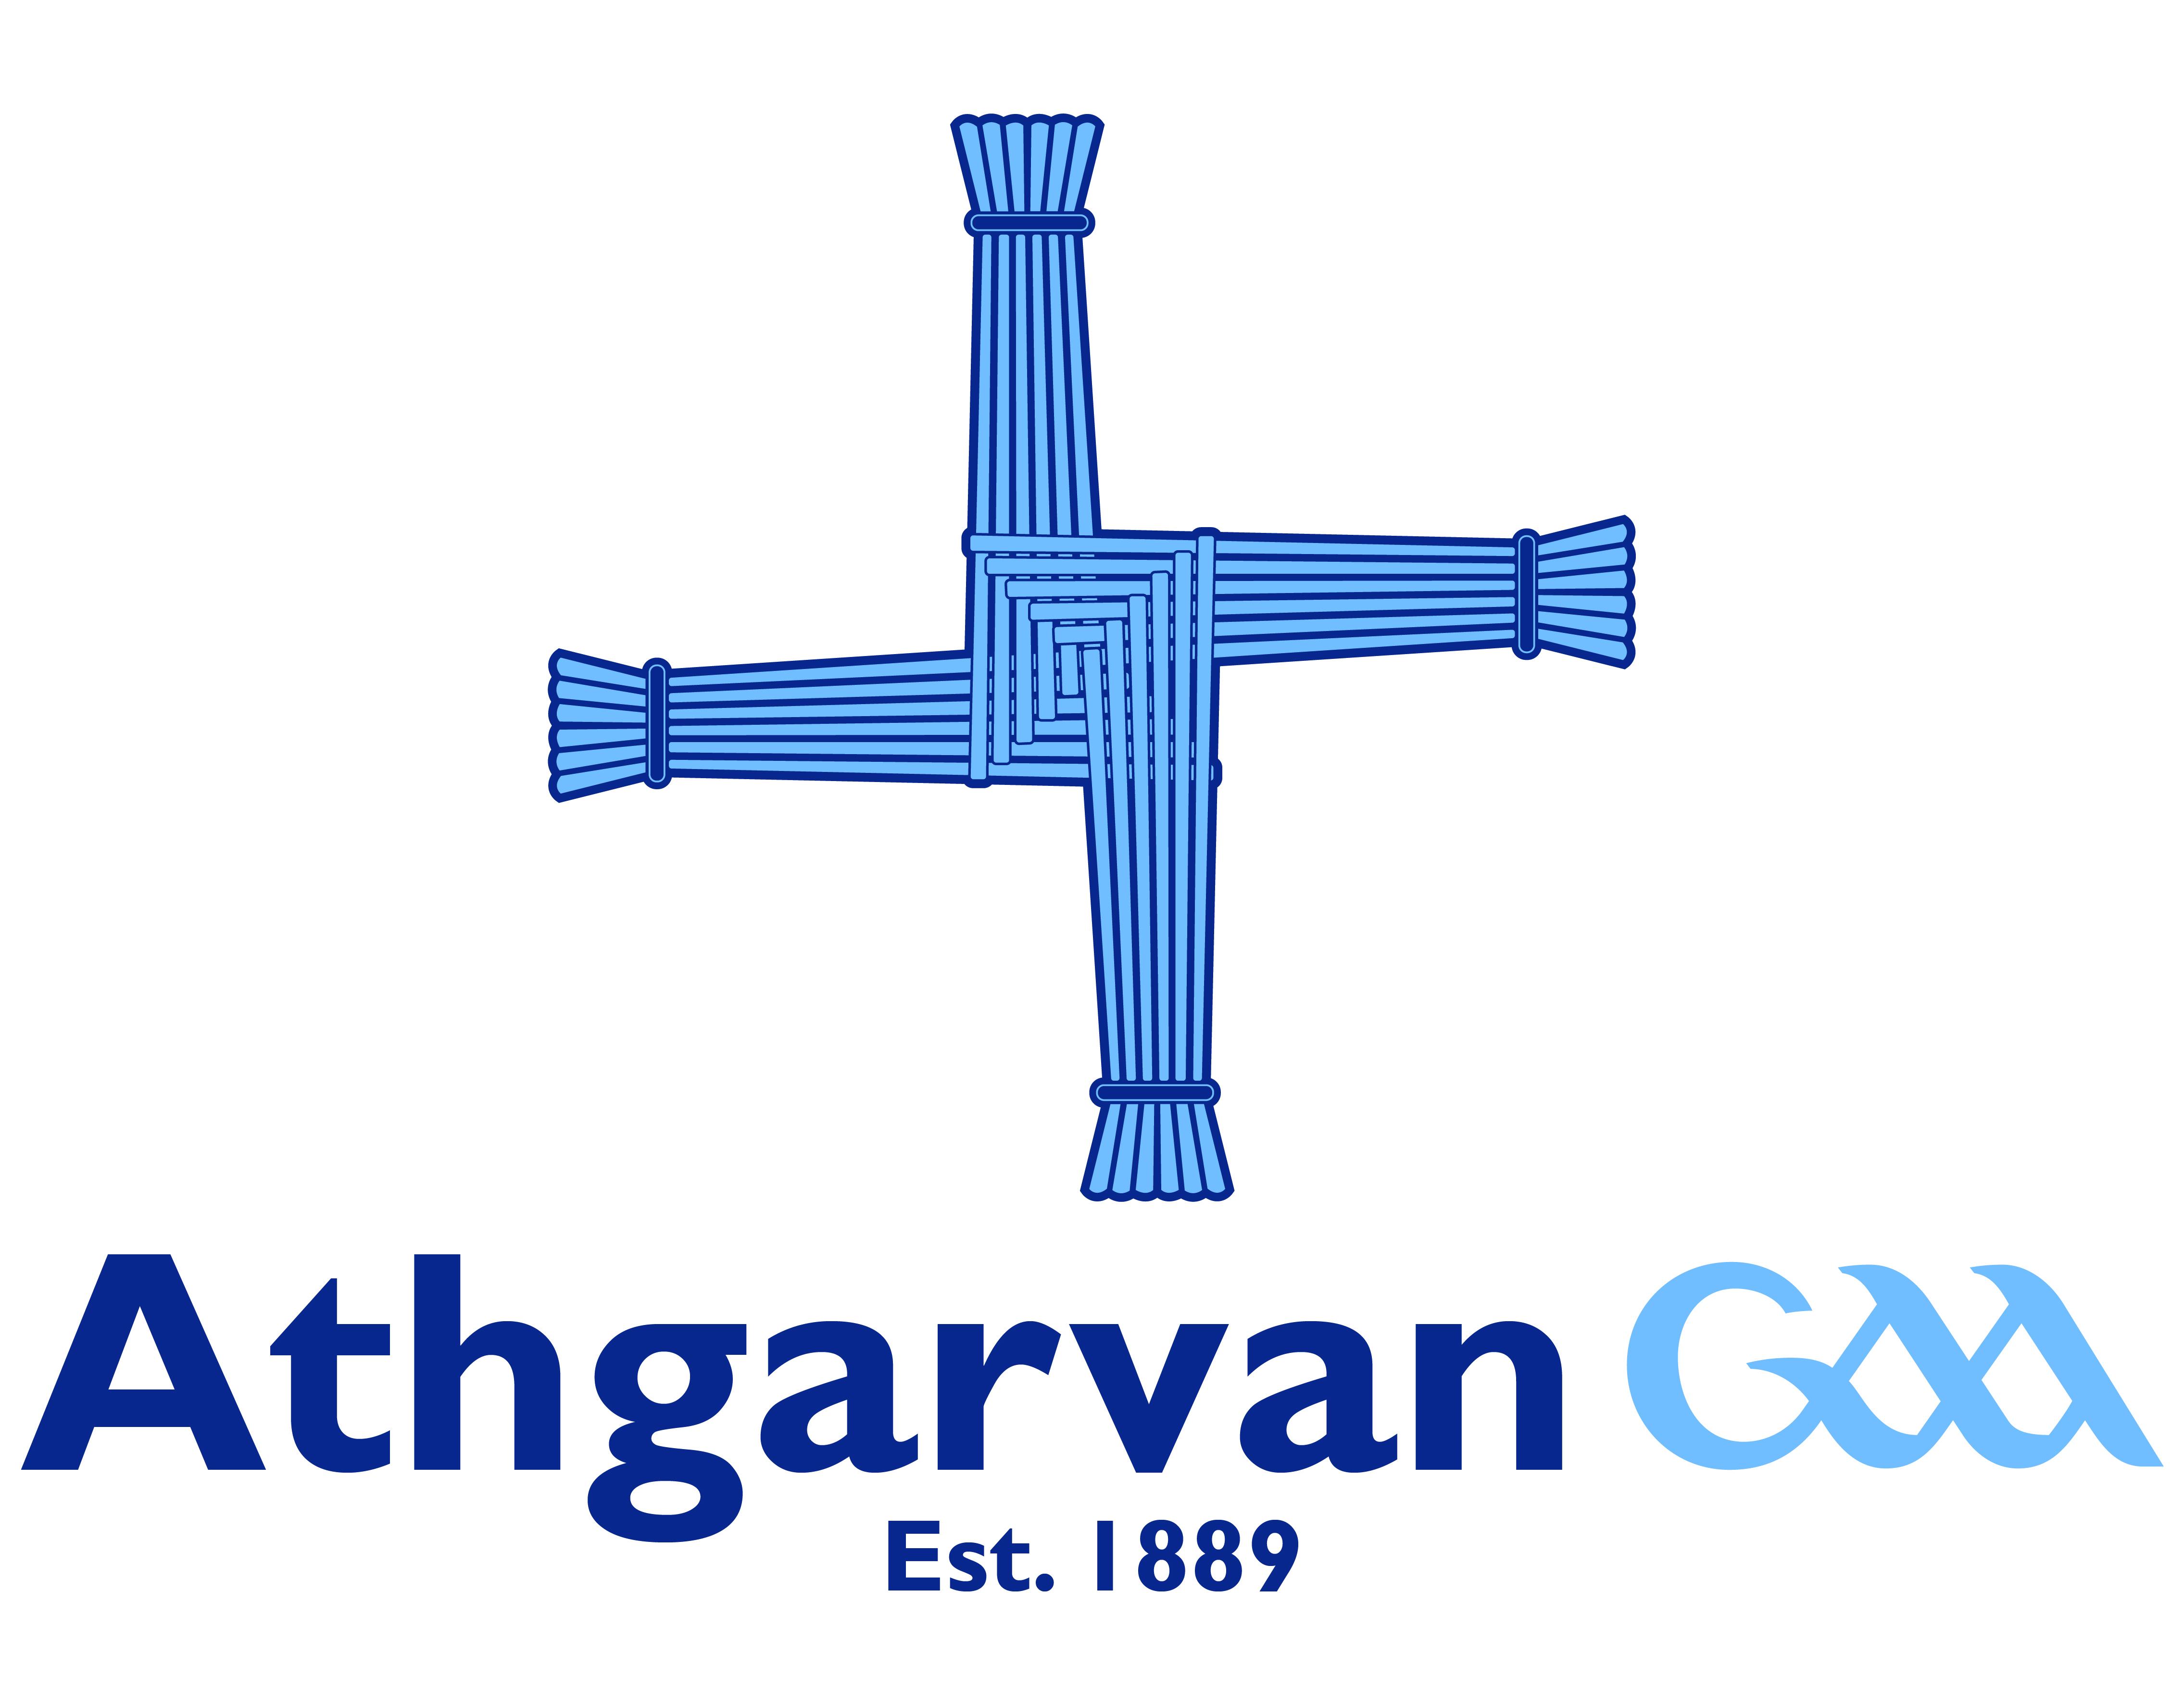 athgarvan